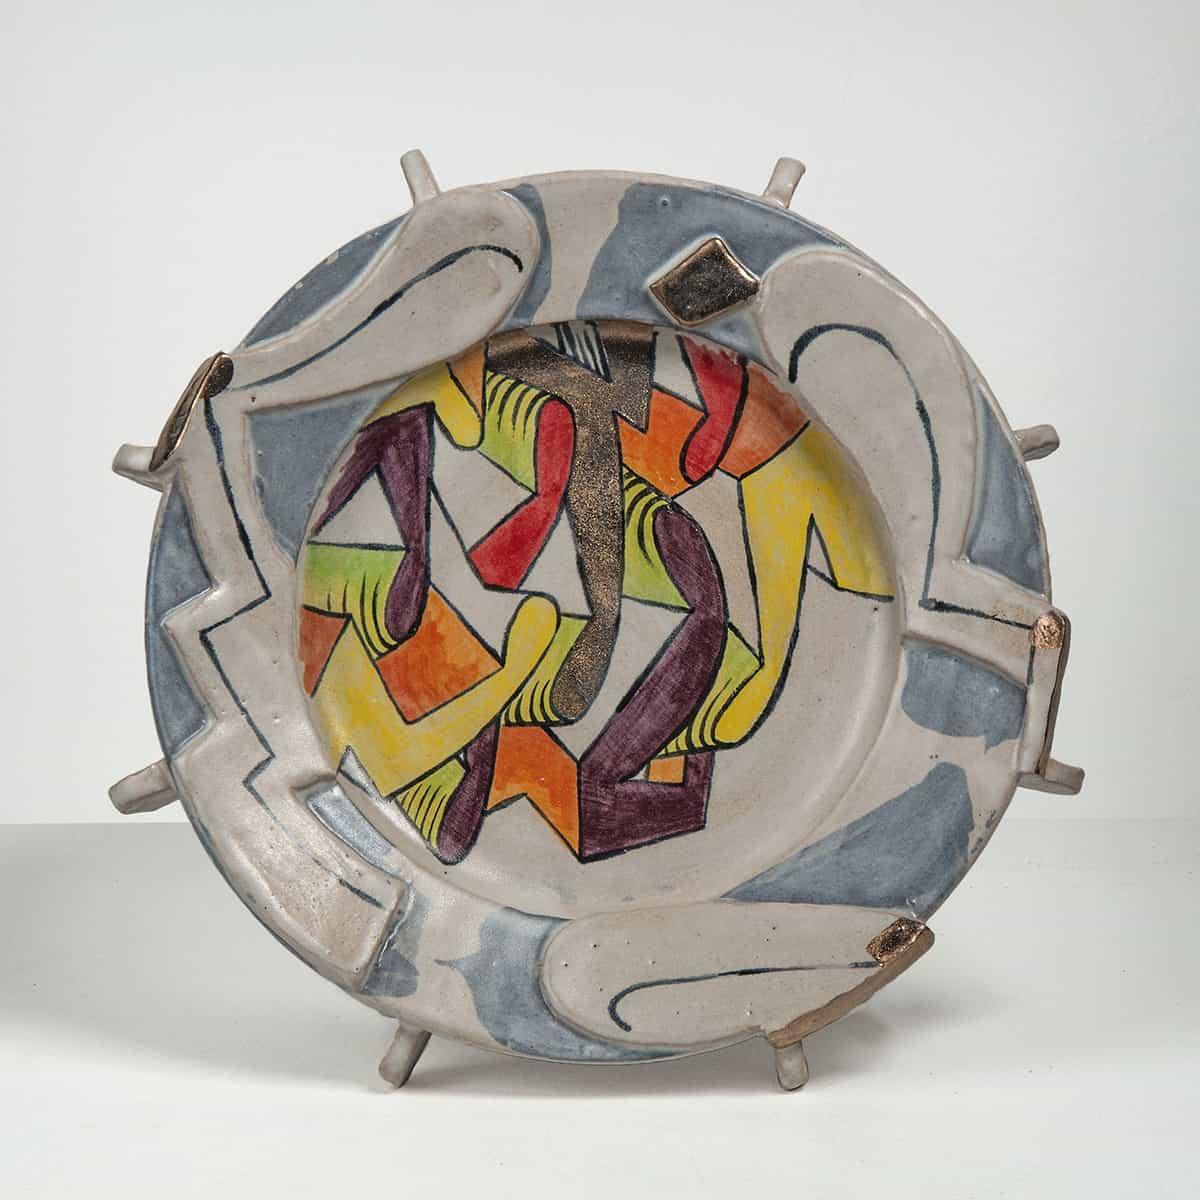 Untitled Platter #4